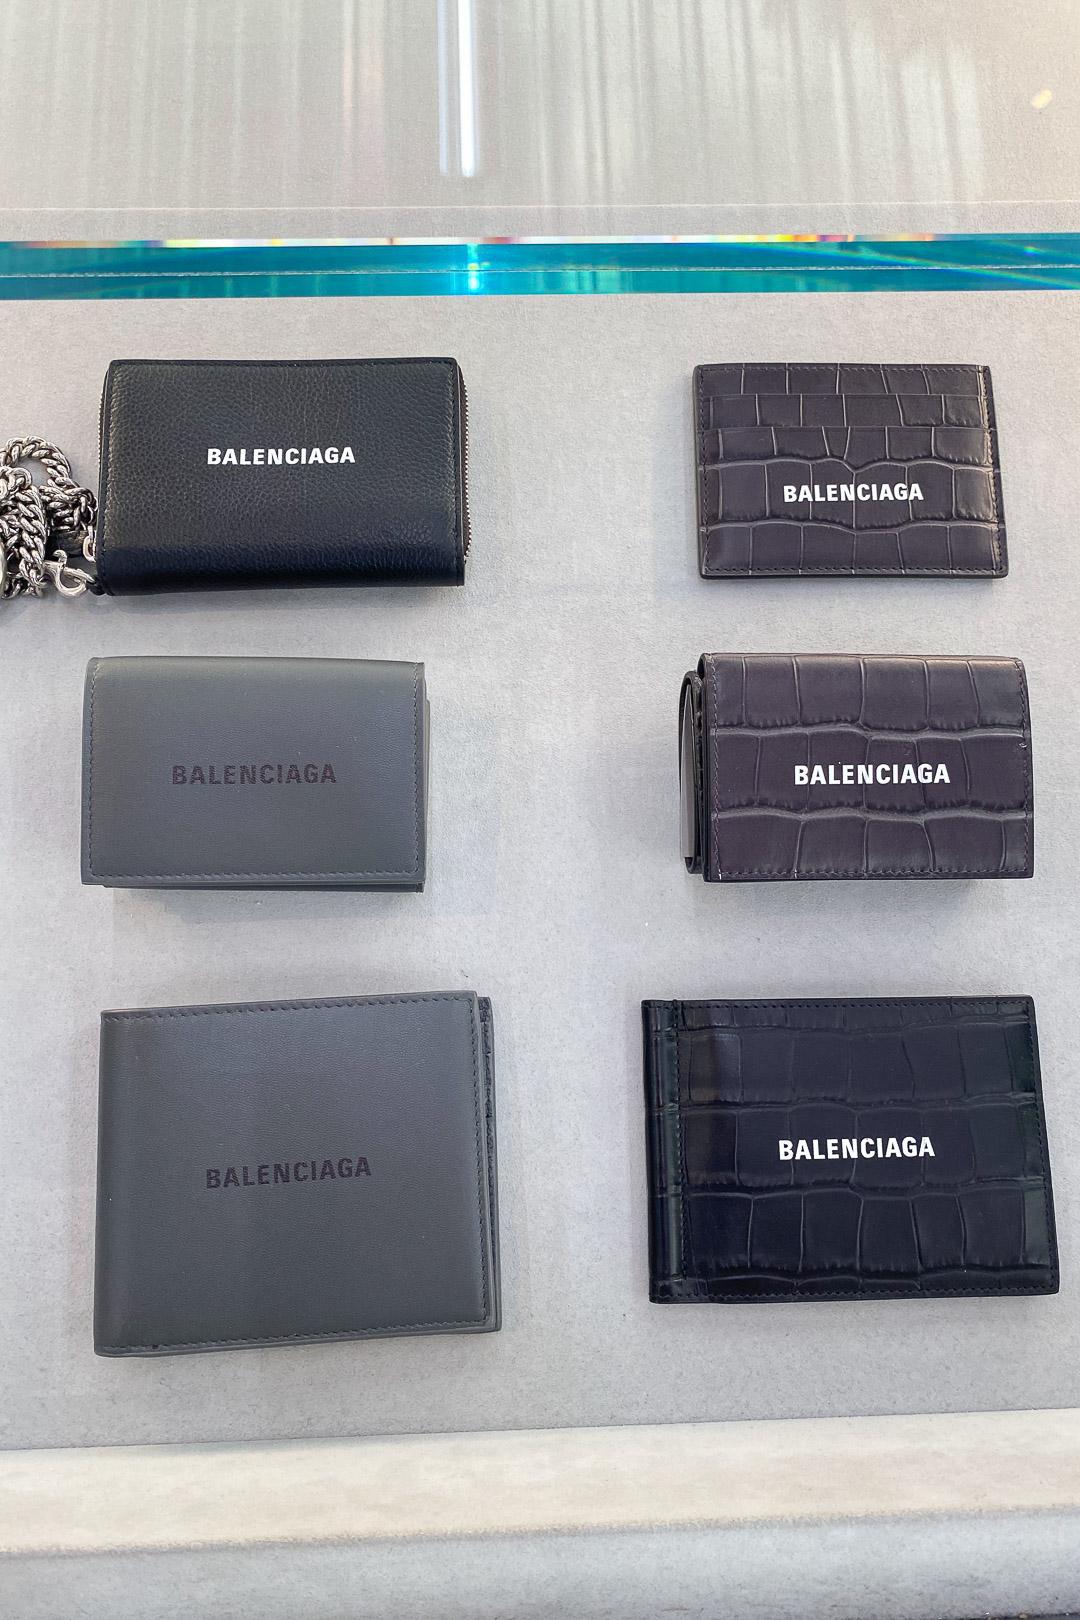 Balenciaga Hawaii Waikiki Men's Wallet Selection